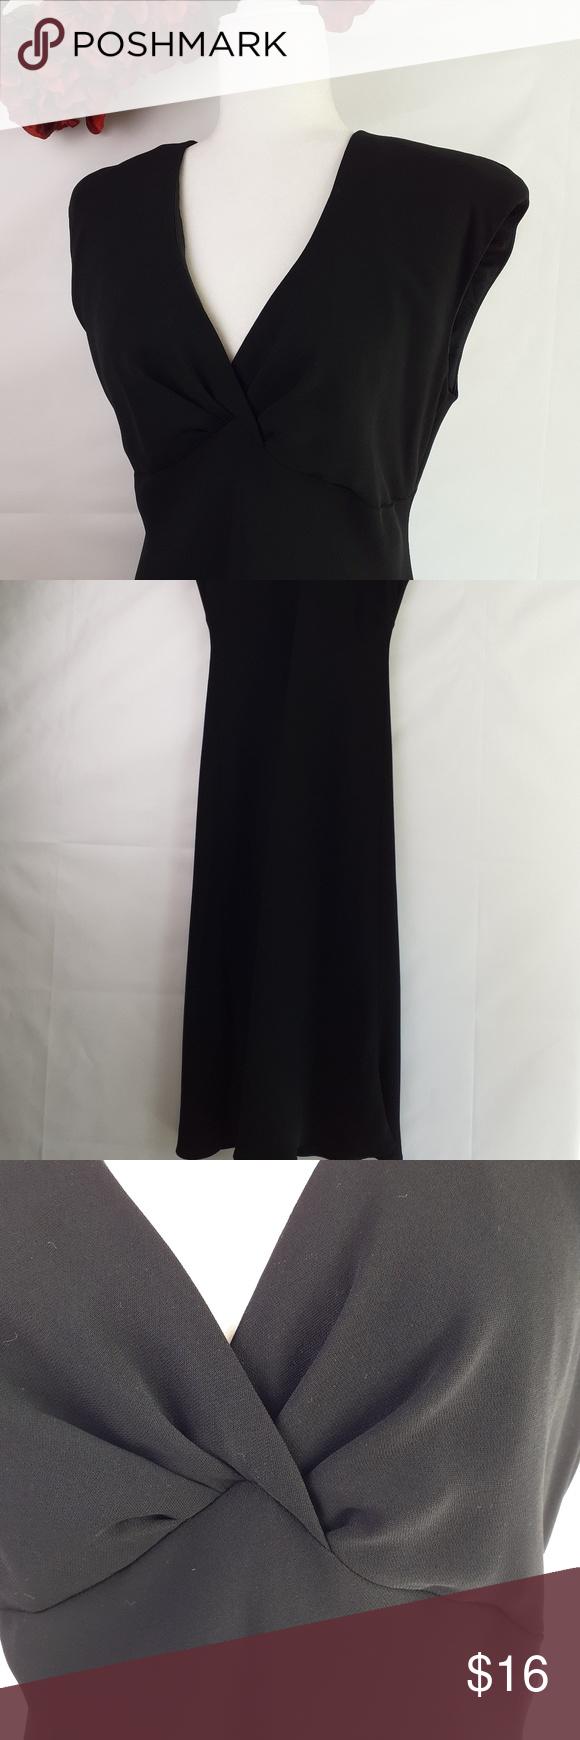 Jones New York Elegant Black Dress Size 12 Elegant Black Dress Clothes Design Jones New York [ 1740 x 580 Pixel ]